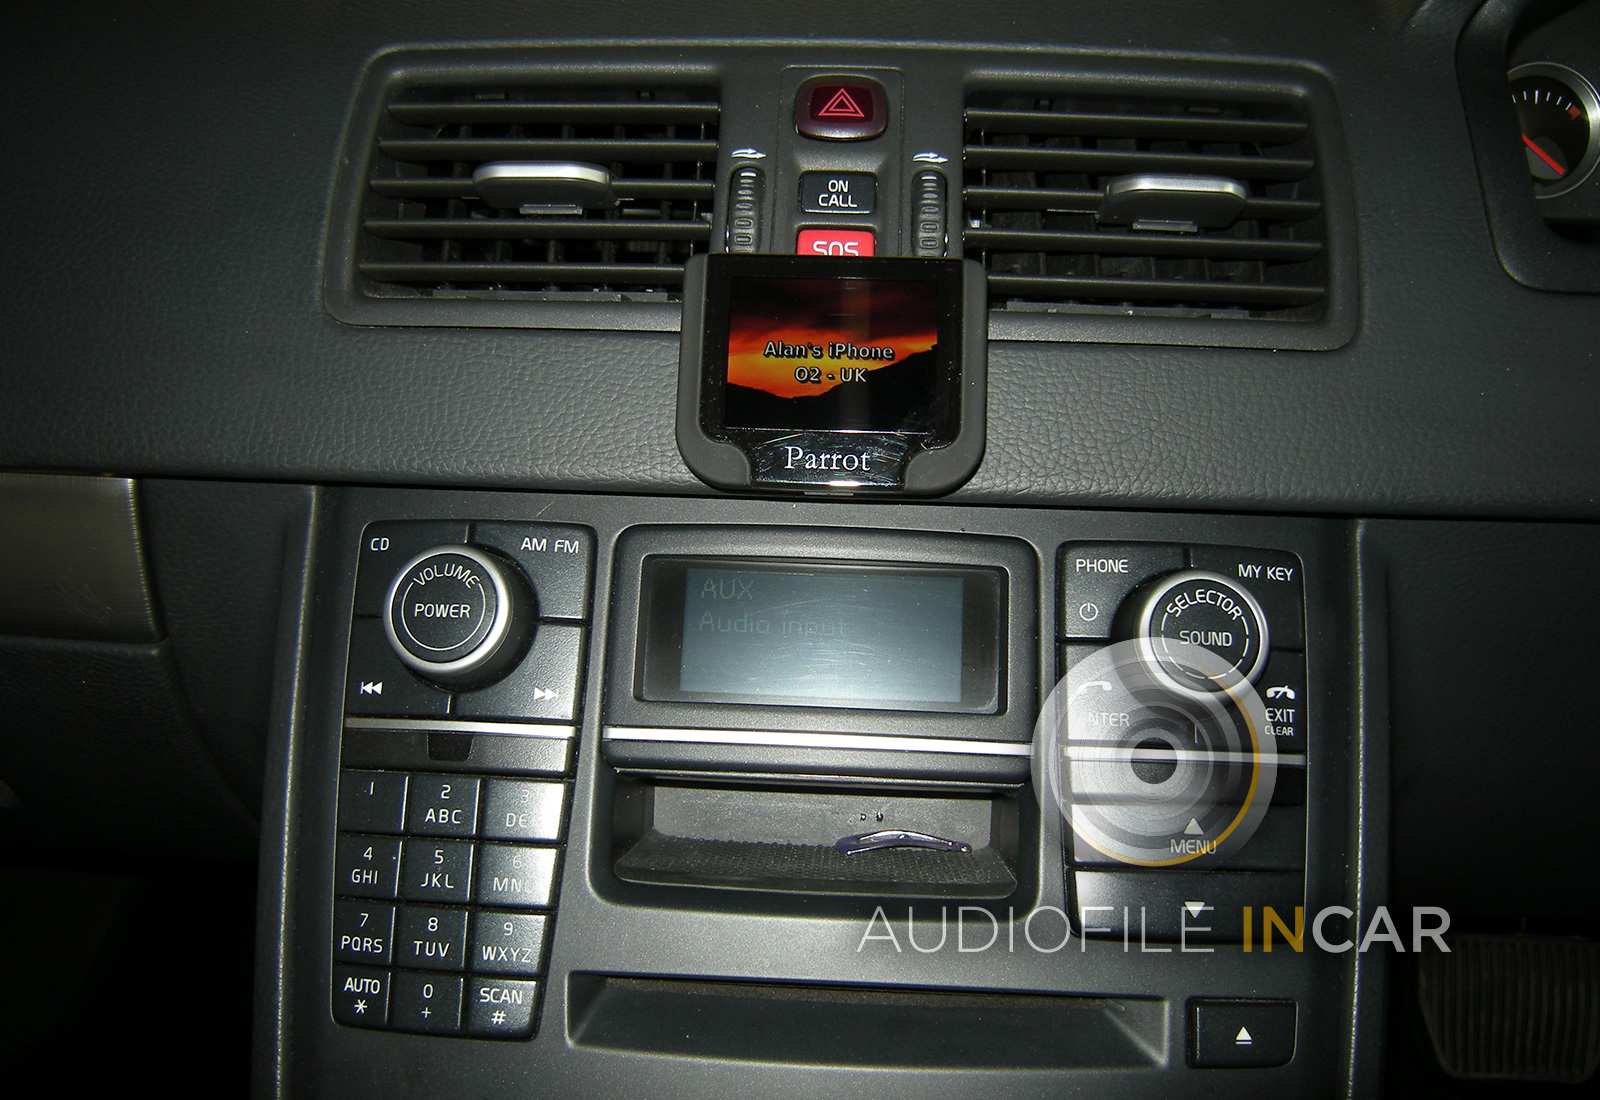 Audiofileincar